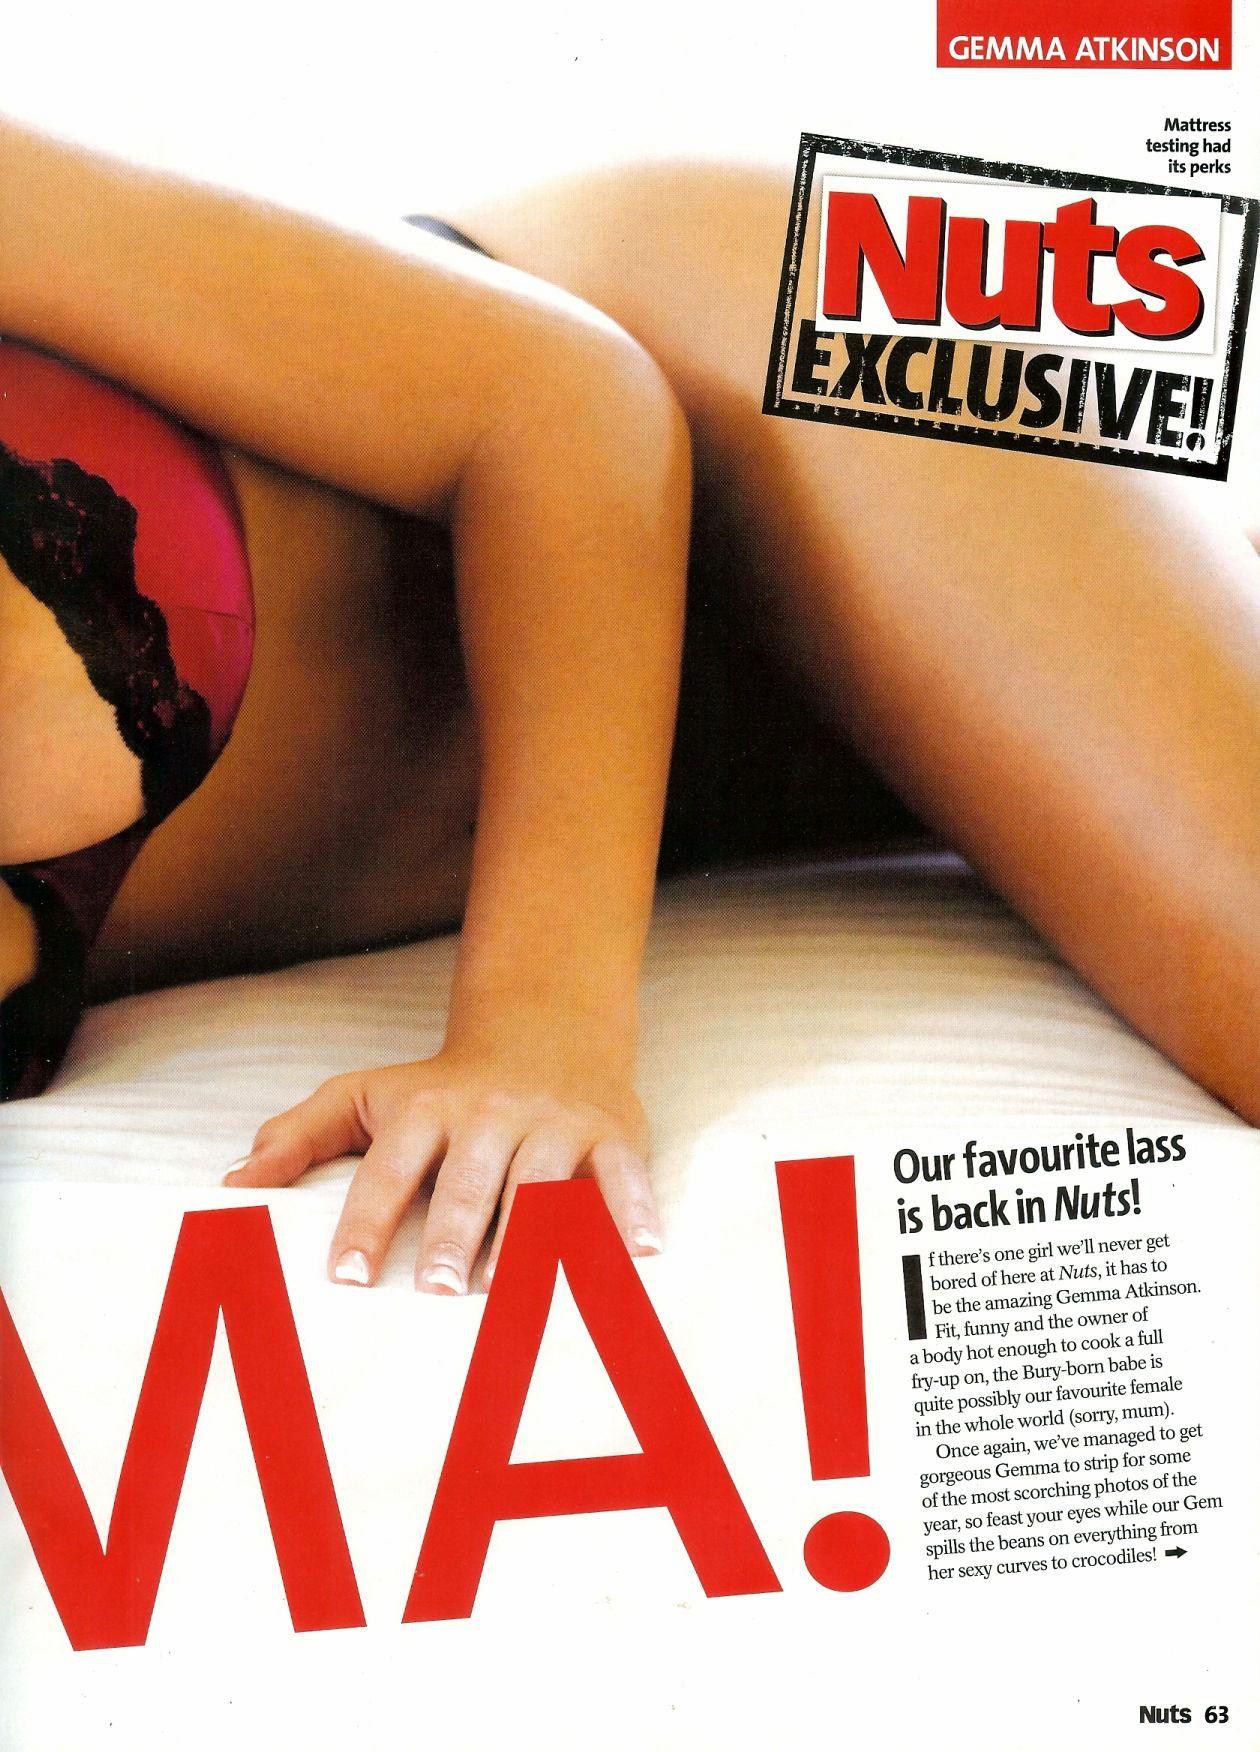 06045_Gemma_Atkinson_Nuts_magazine-3_122_1075lo.jpg